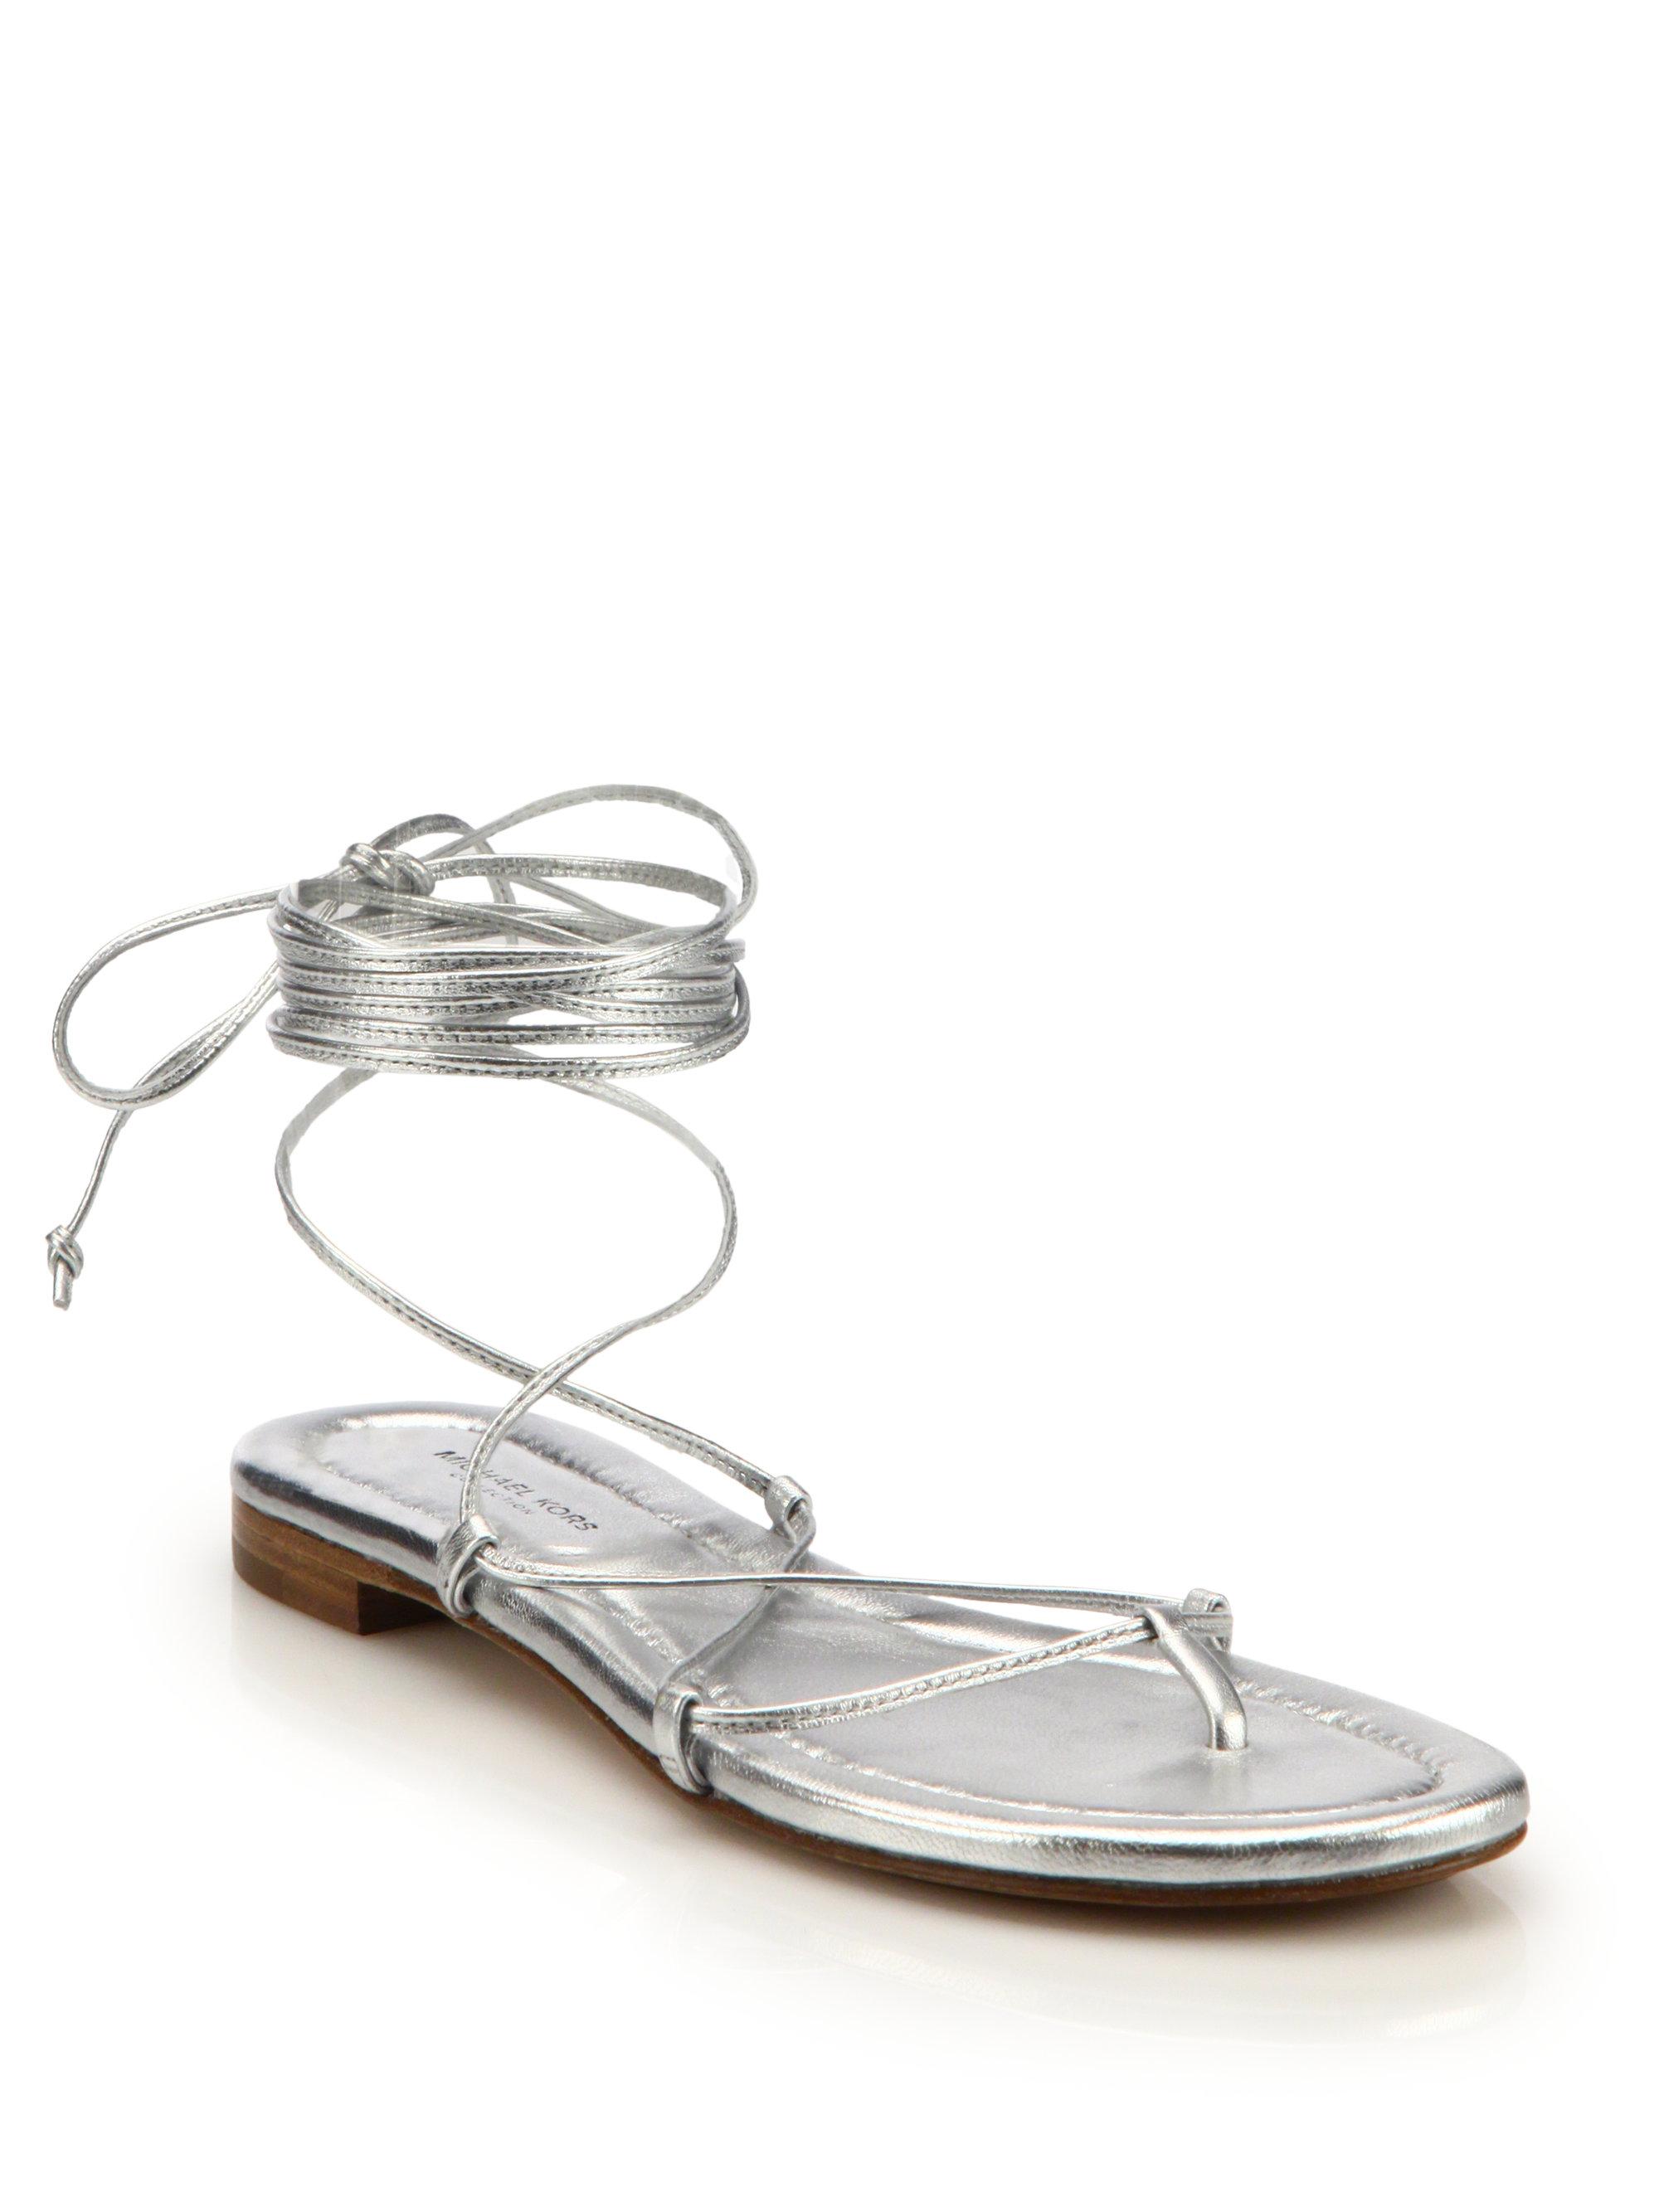 6197d41e9c52 Lyst - Michael Kors Bradshaw Metallic Leather Lace-up Sandals in ...